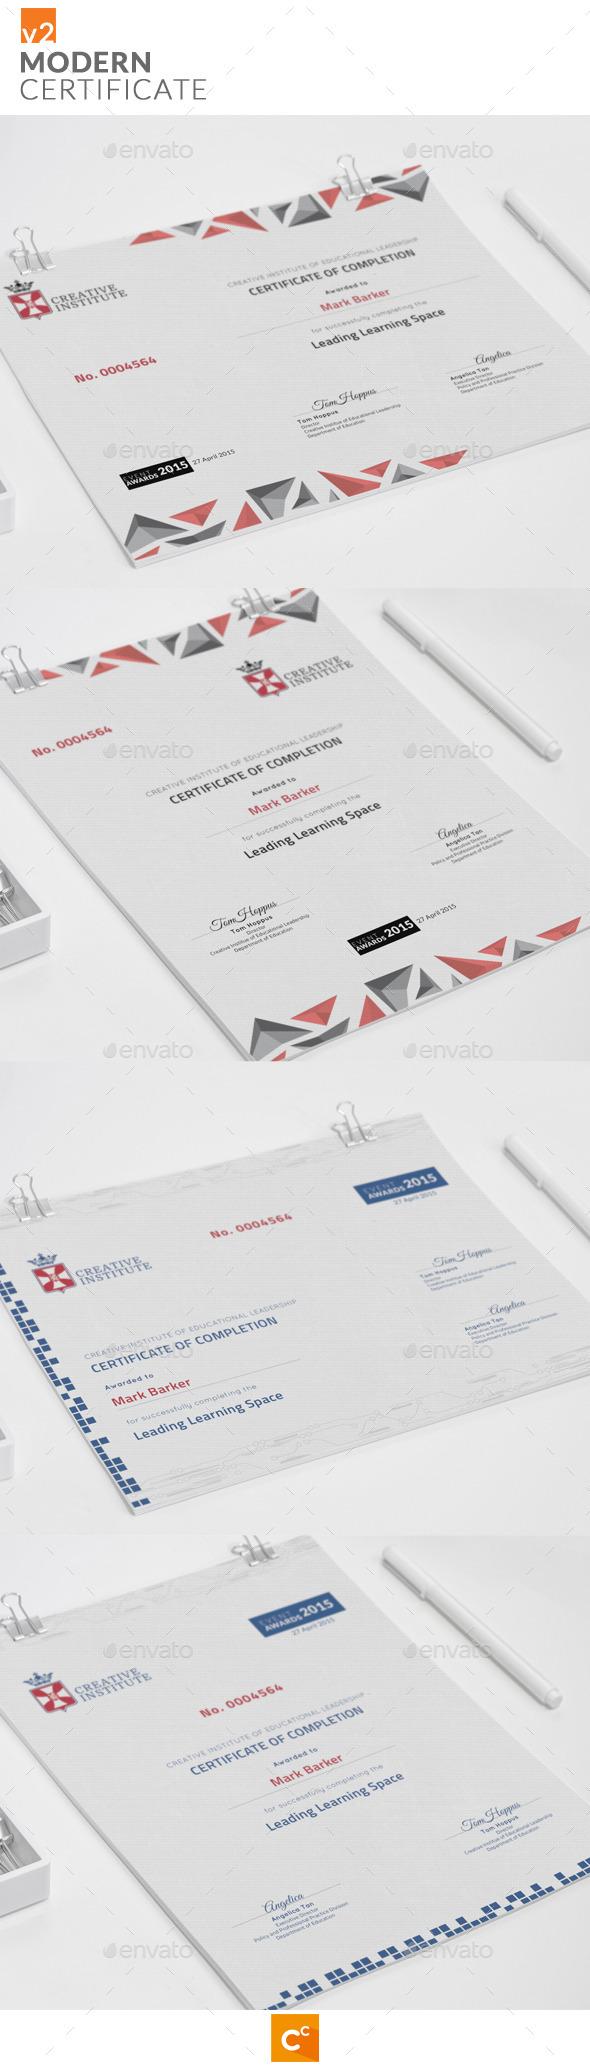 GraphicRiver Modern Certificate v2 11417367